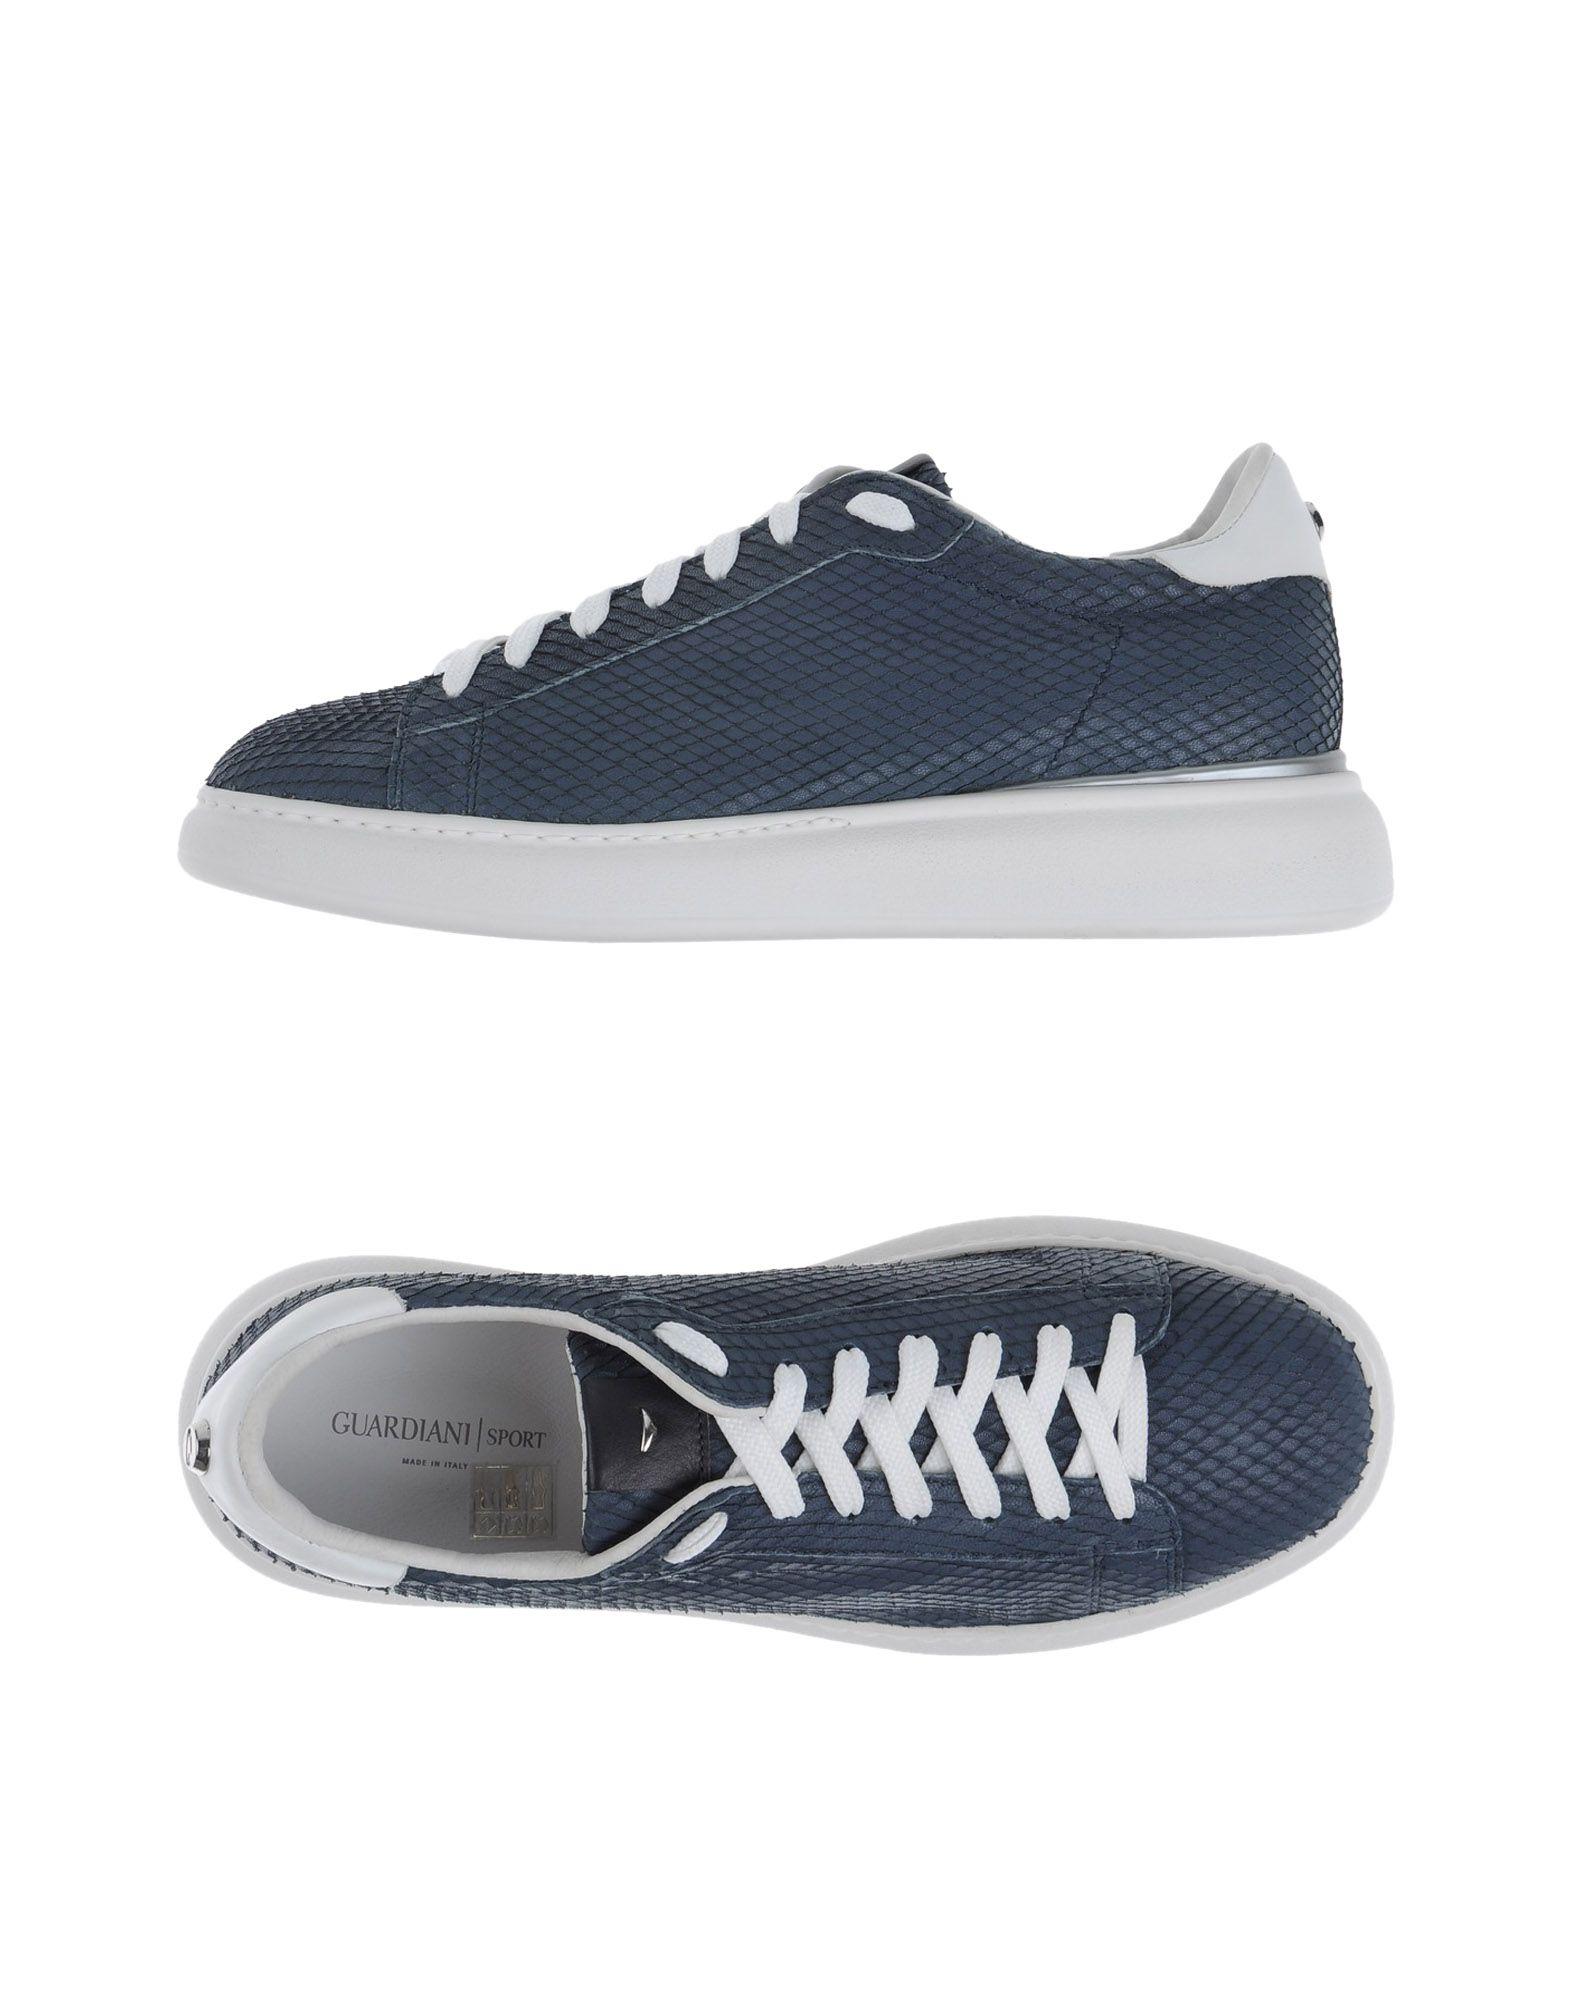 Alberto Alberto Guardiani Sneakers - Men Alberto Alberto Guardiani Sneakers online on  Canada - 11232516PK 482abd